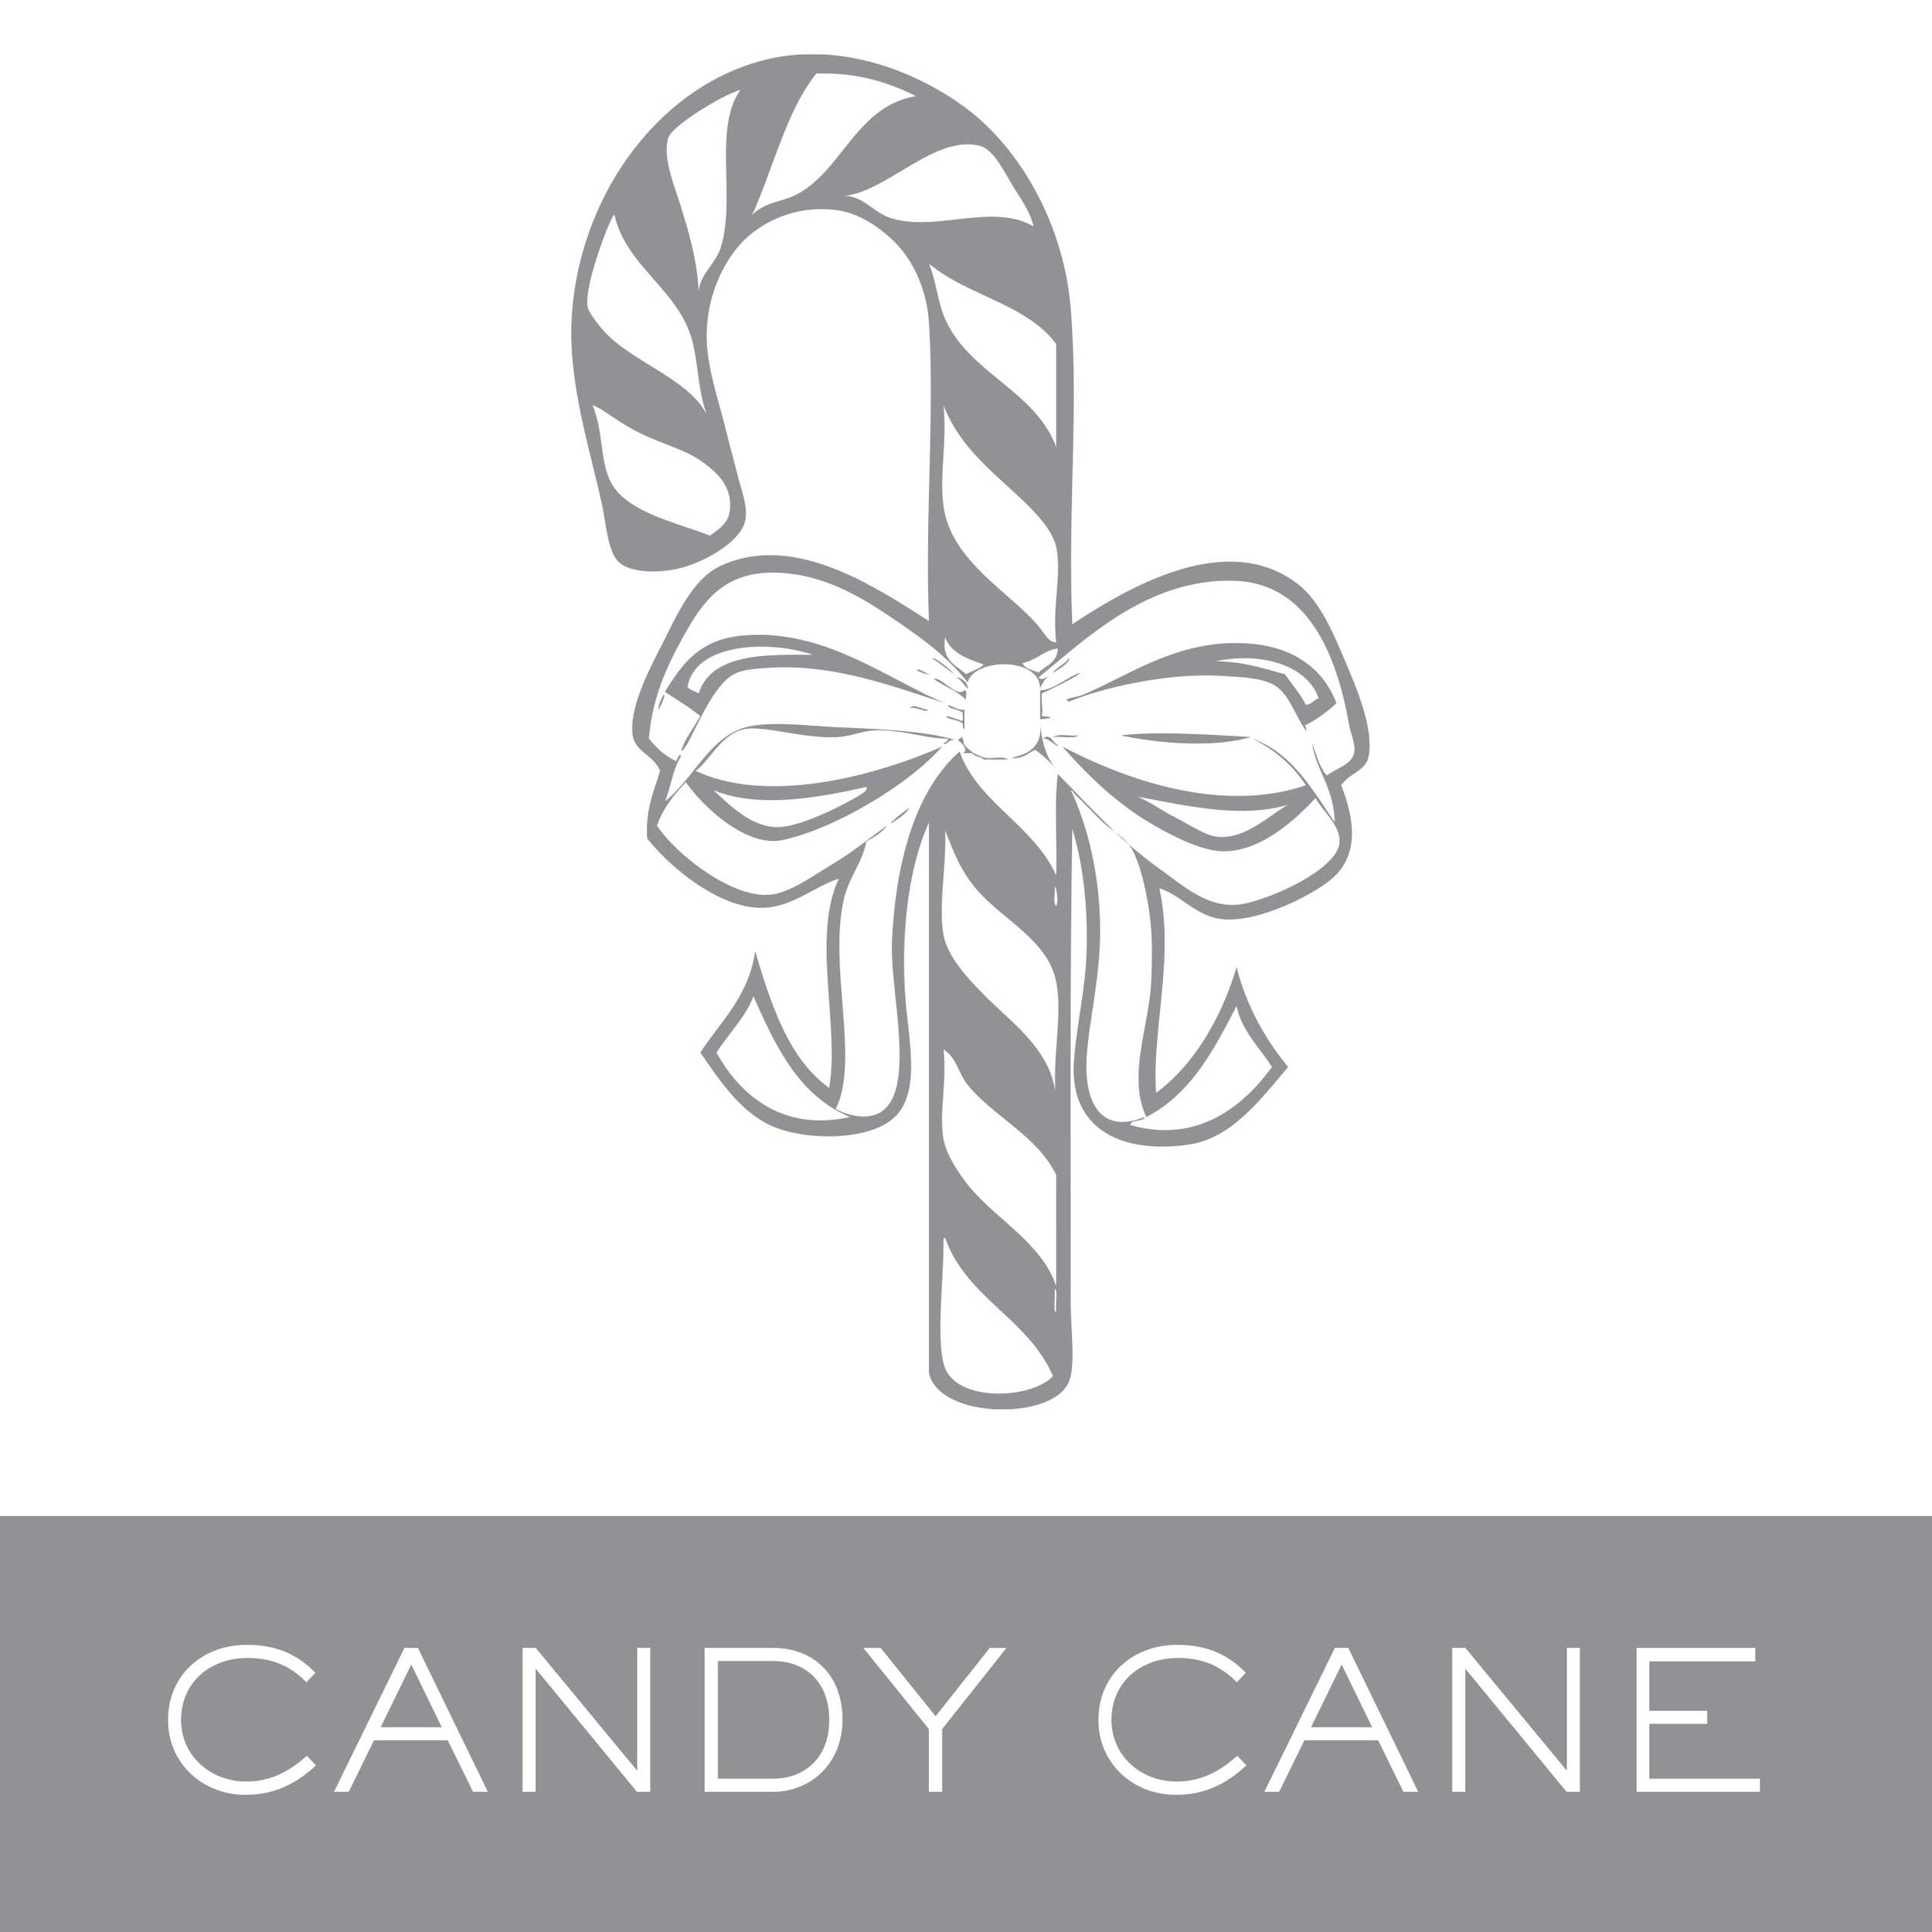 candycane.jpg